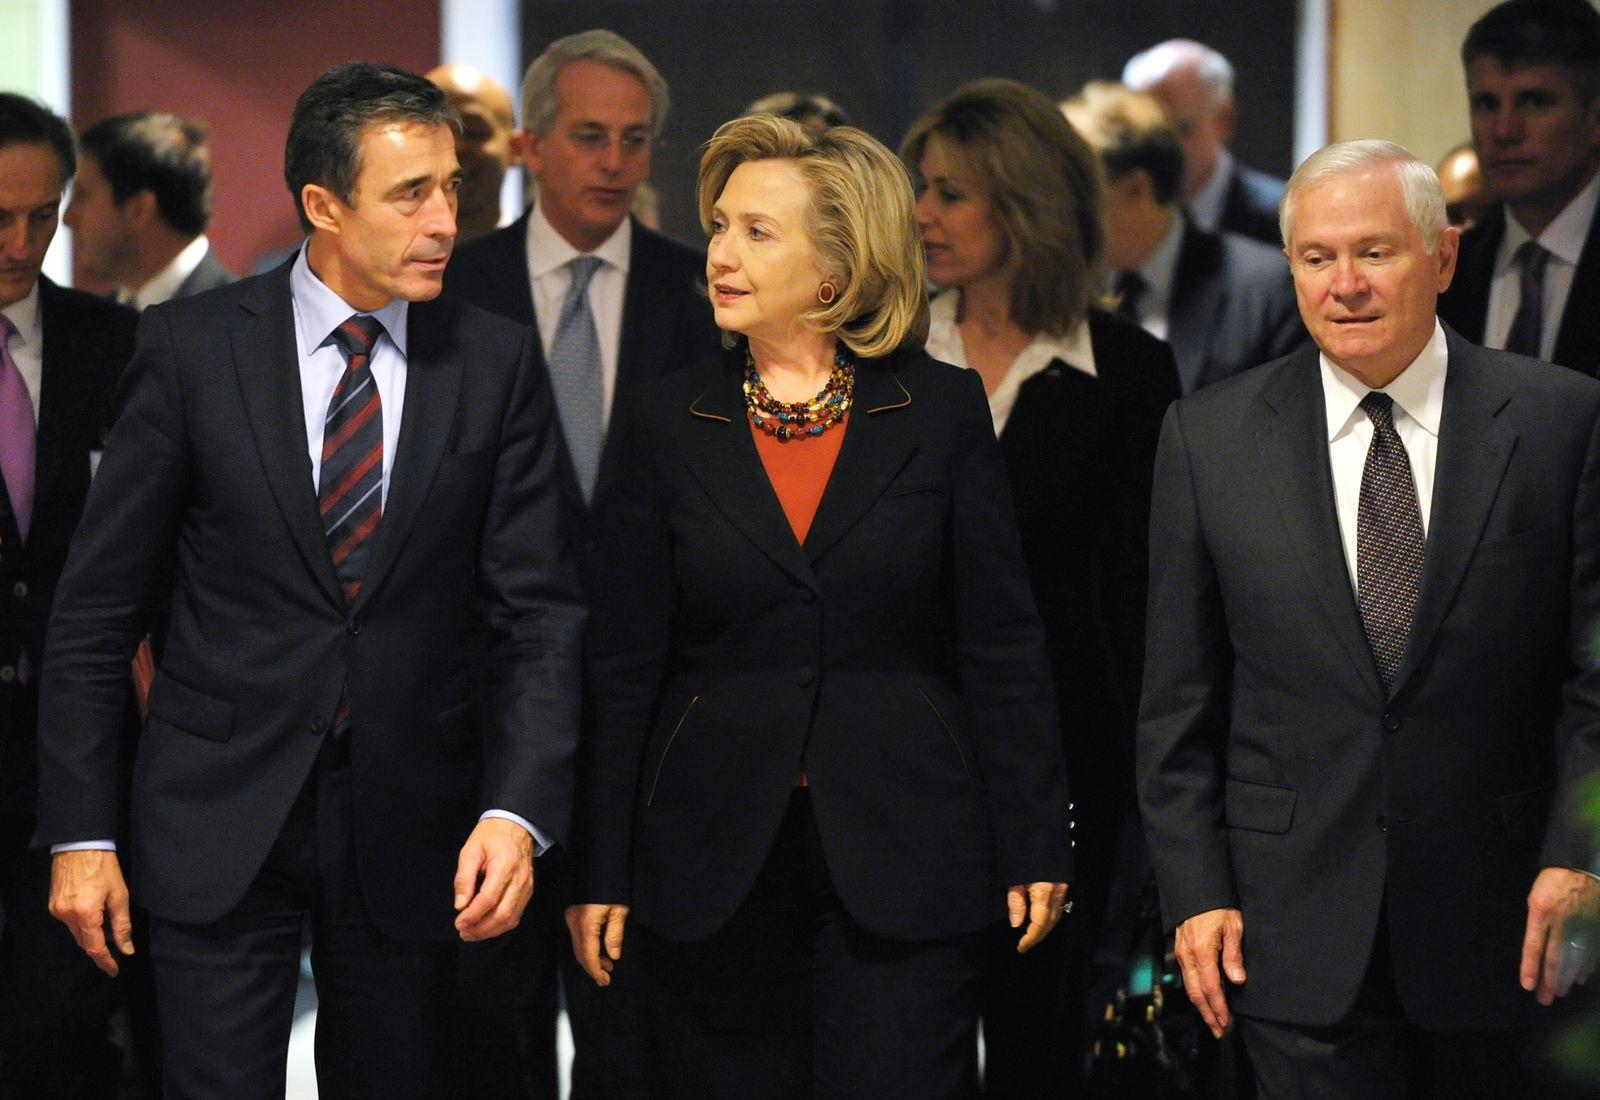 BELGIUM-NATO-US-CLINTON